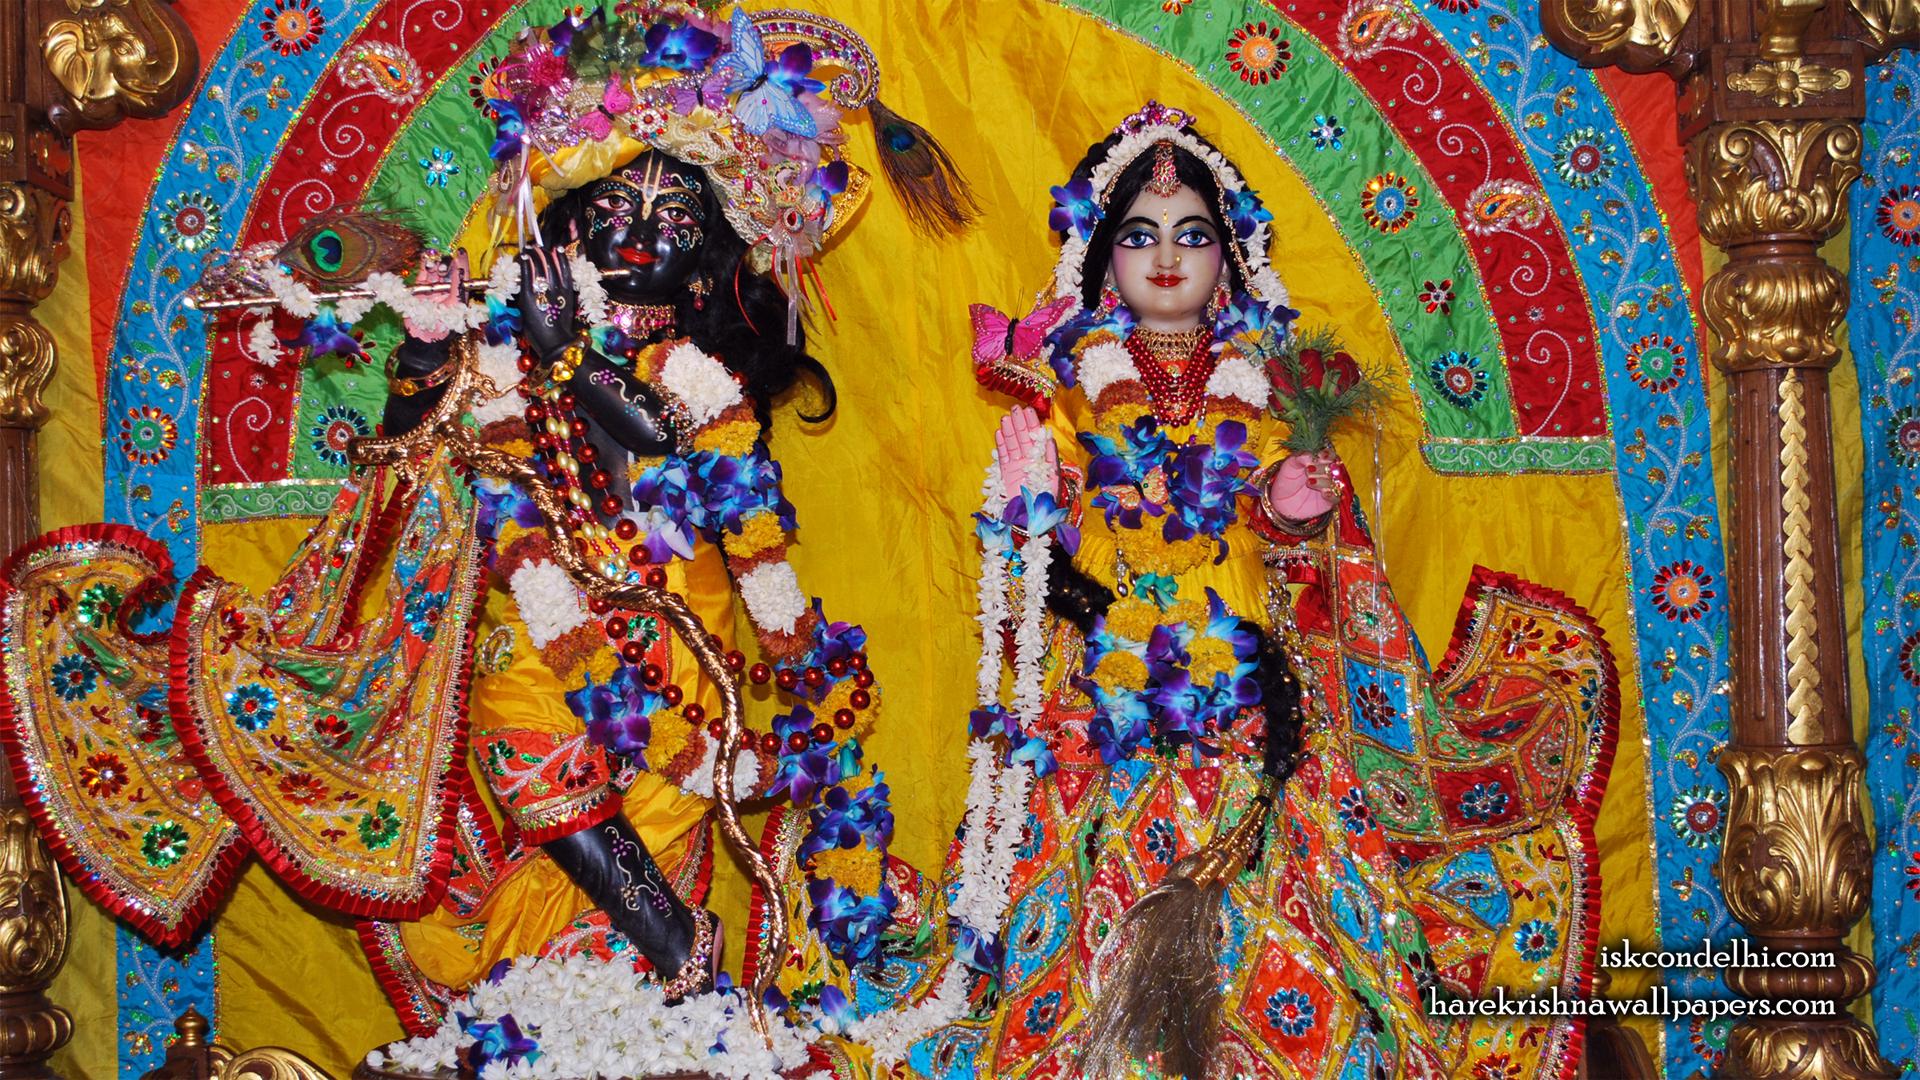 Sri Sri Radha Parthasarathi Wallpaper (012) Size 1920x1080 Download